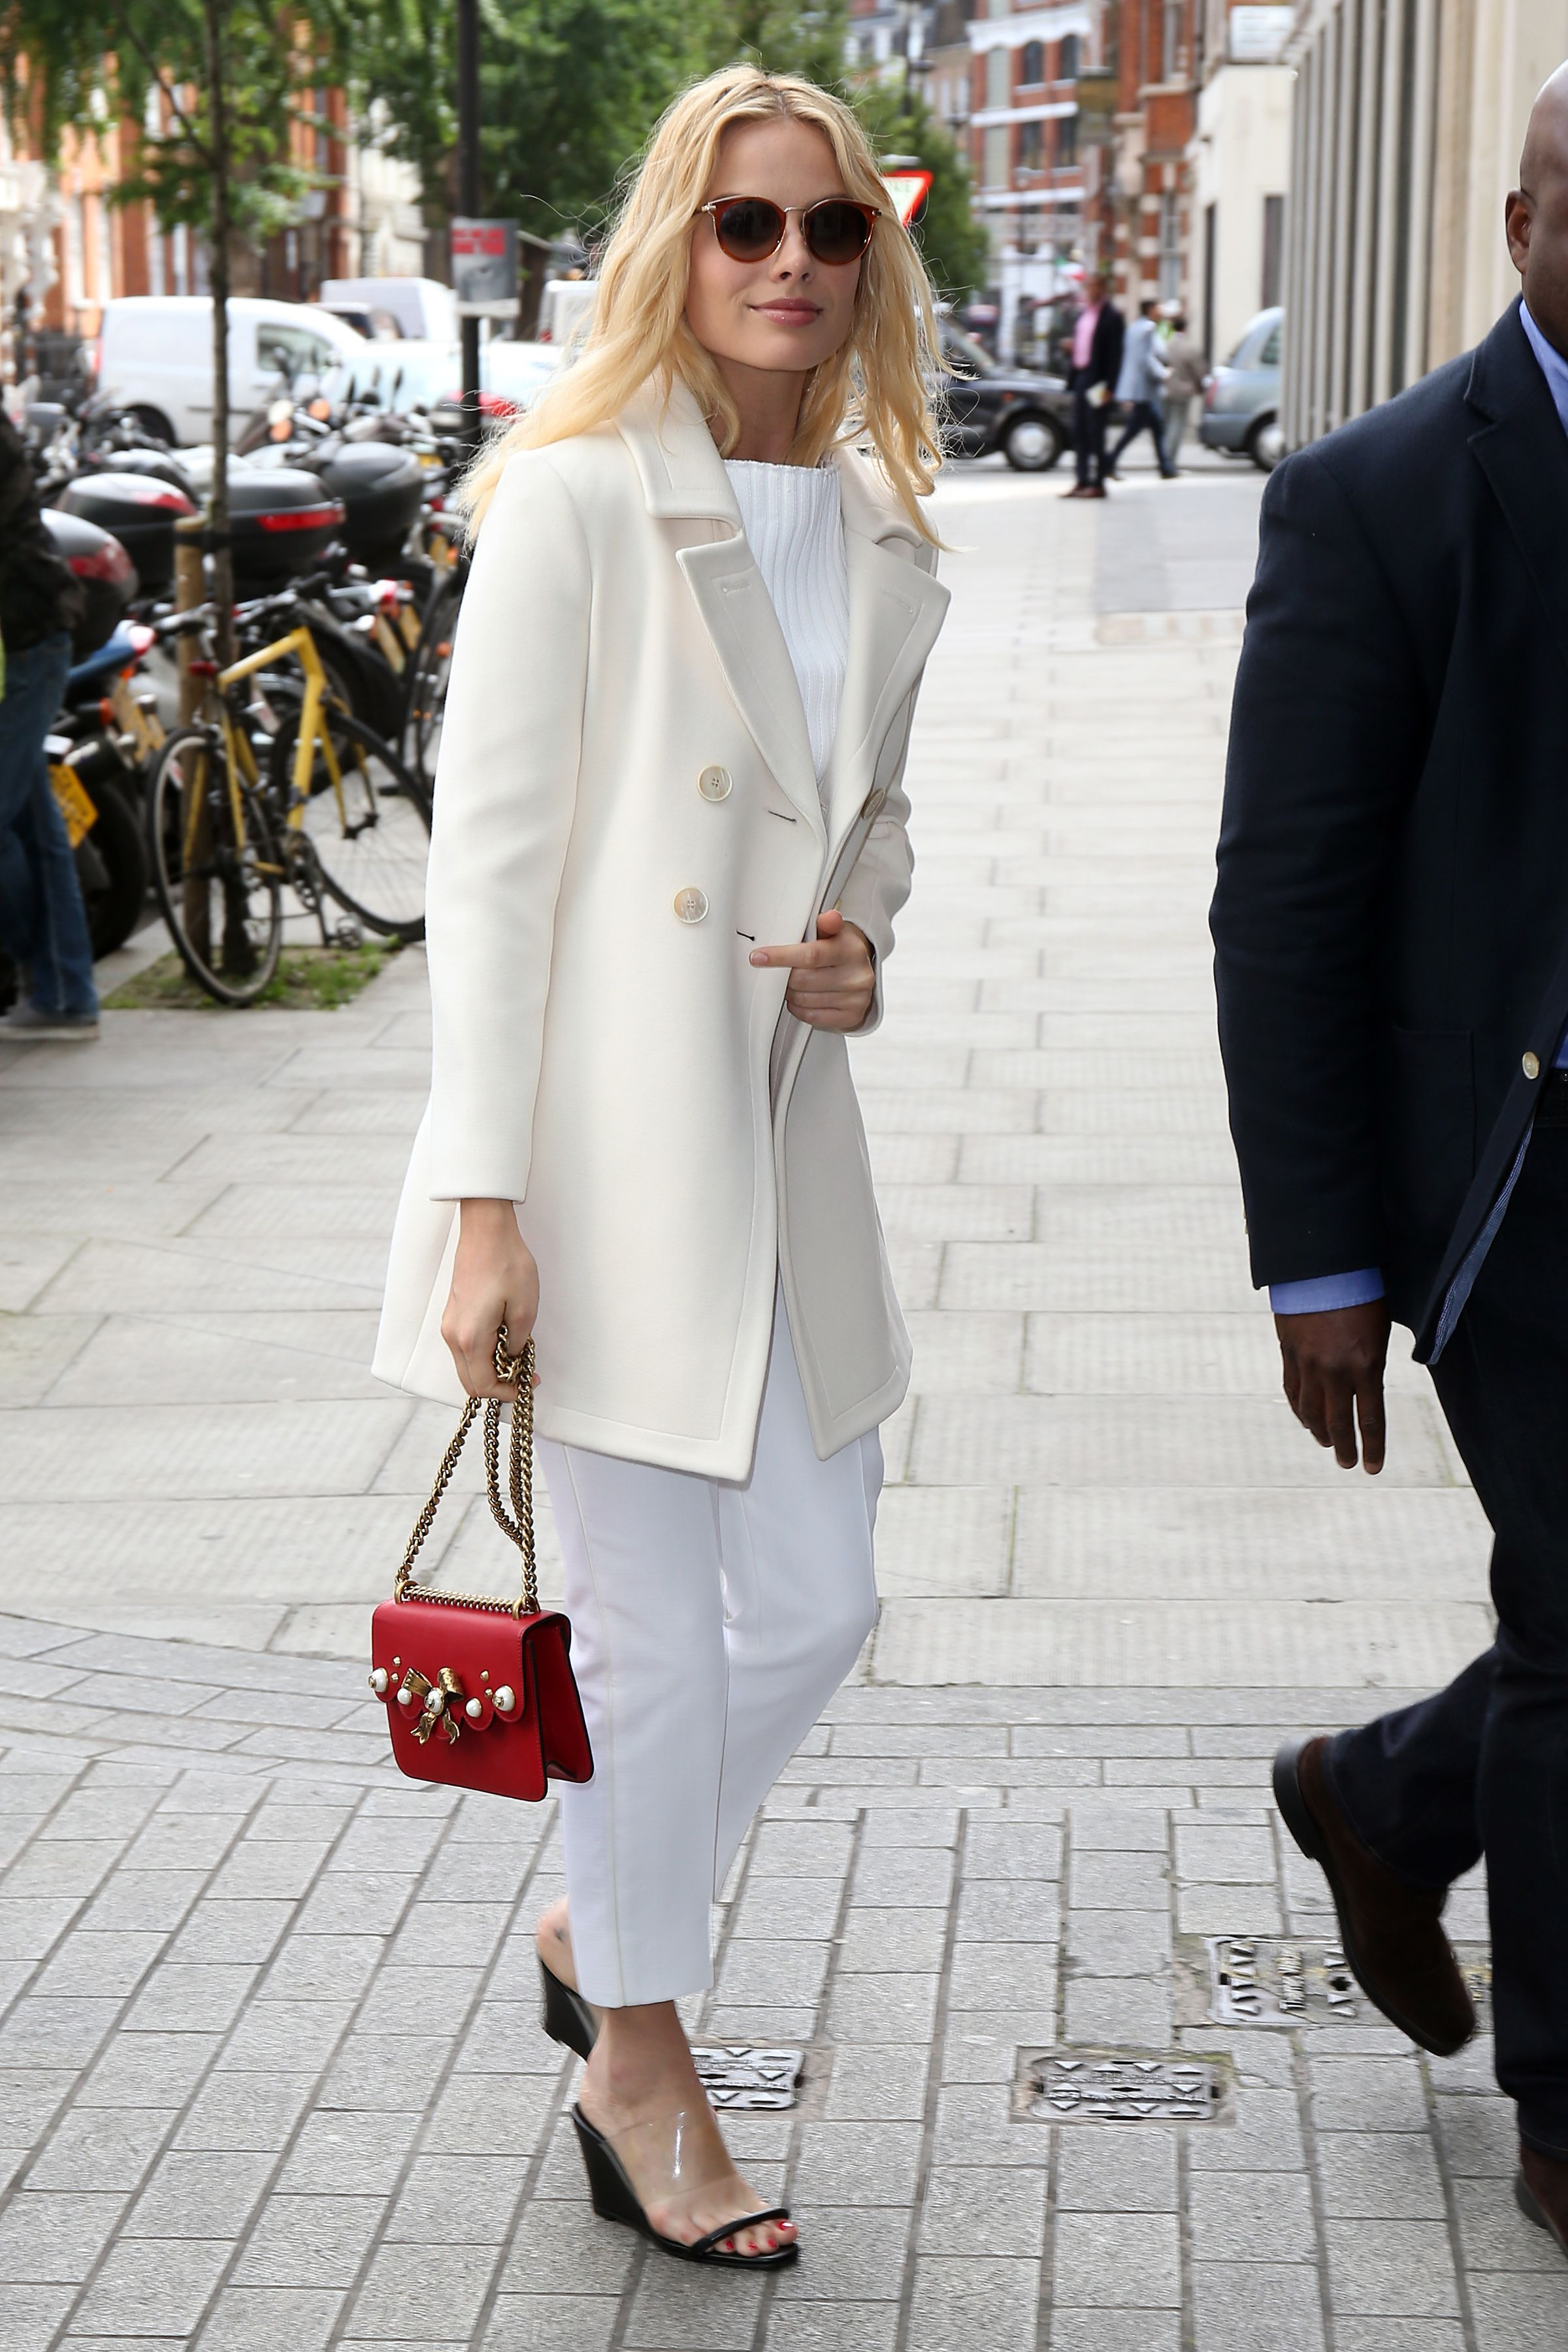 216a8c23611 Margot Robbie Style - Margot Robbie Fashion Photos